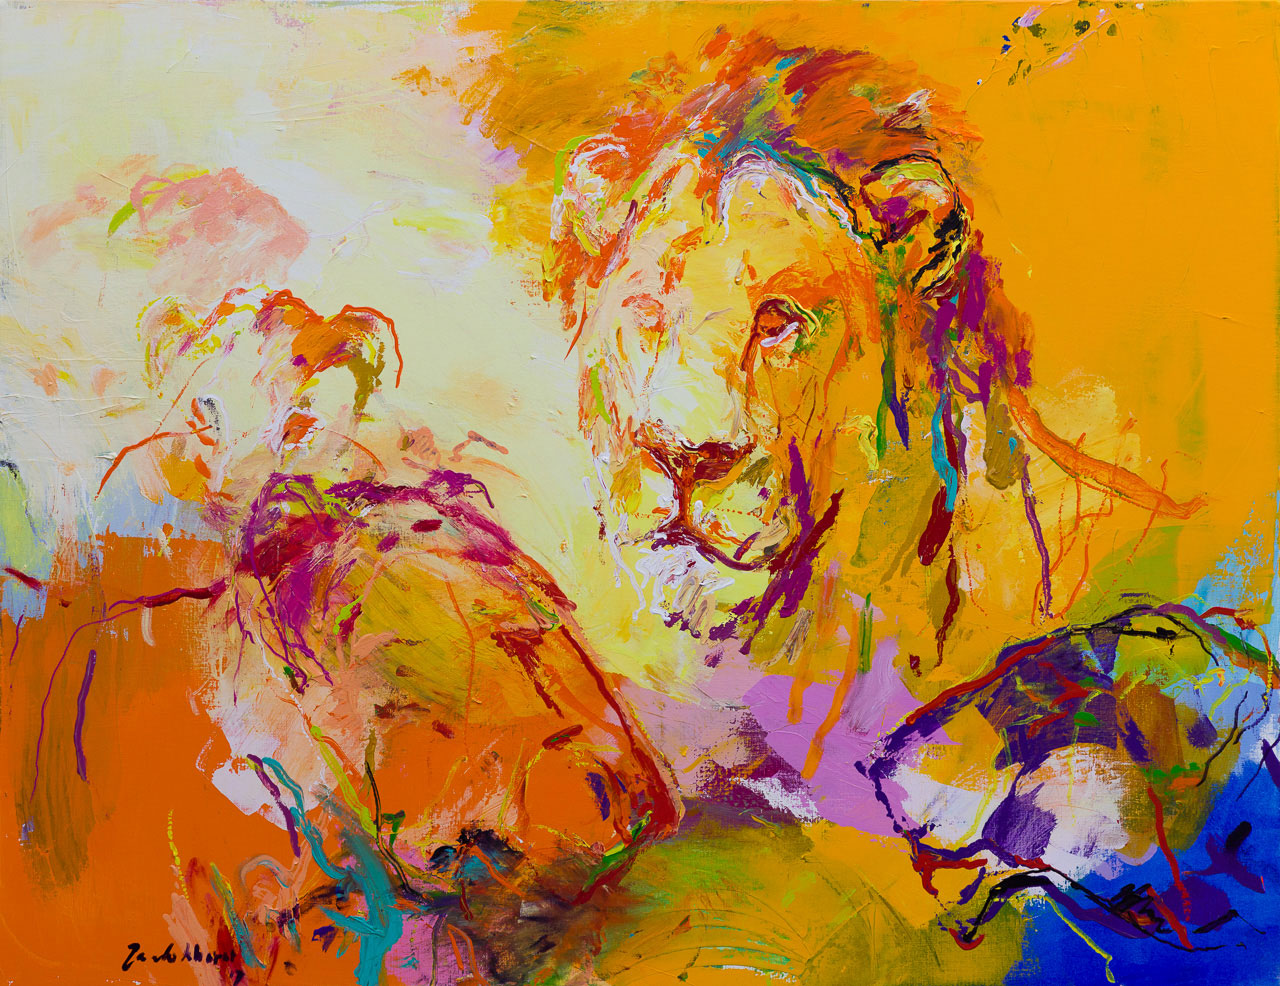 Schilderij leeuwen oranje